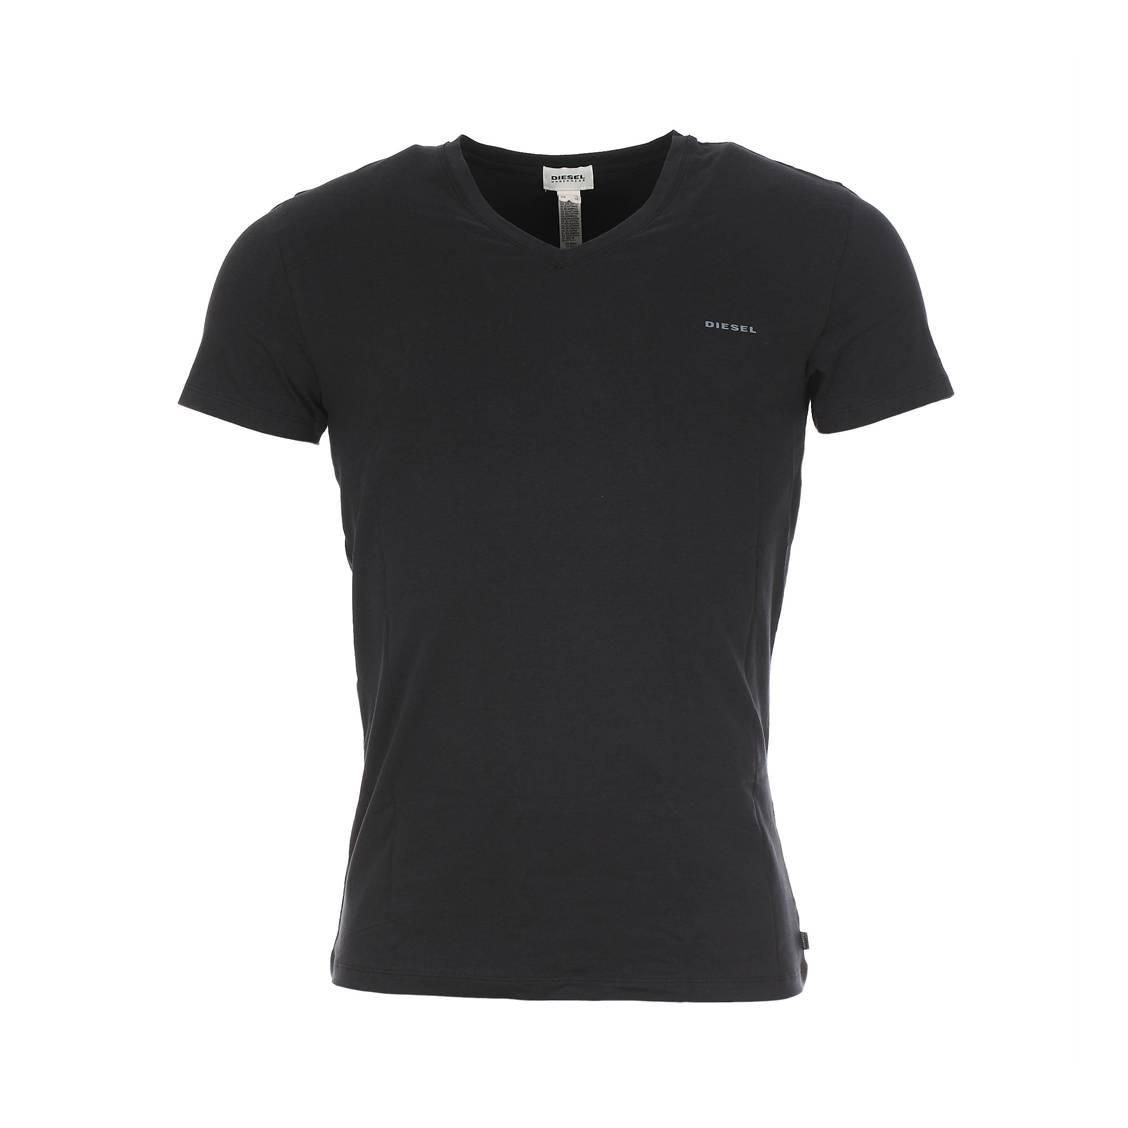 Tee-shirt diesel col v en coton stretch noir